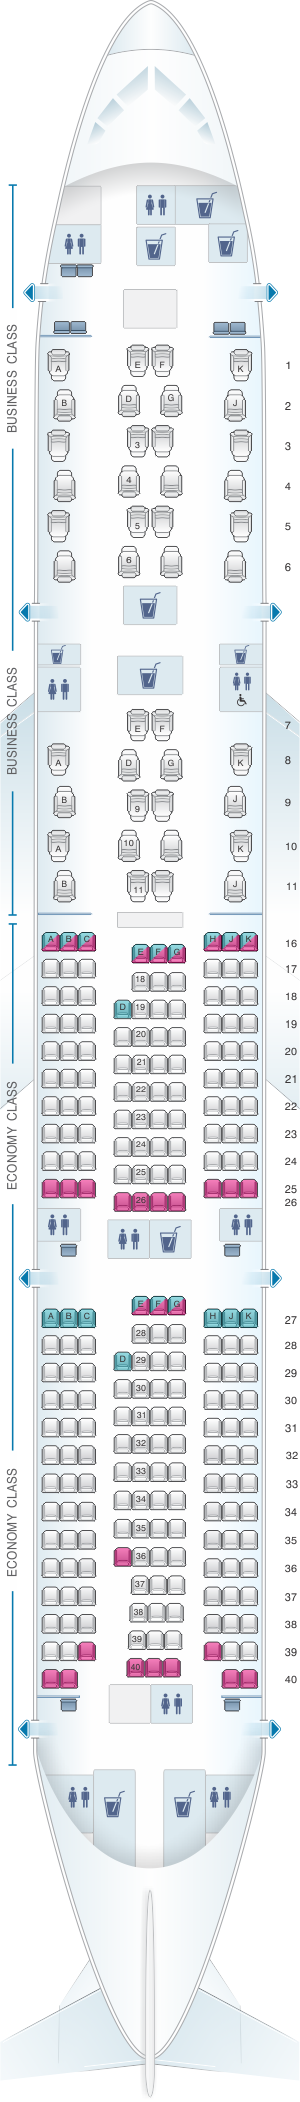 Seat map for Qatar Airways Boeing B777 200LR Qsuite